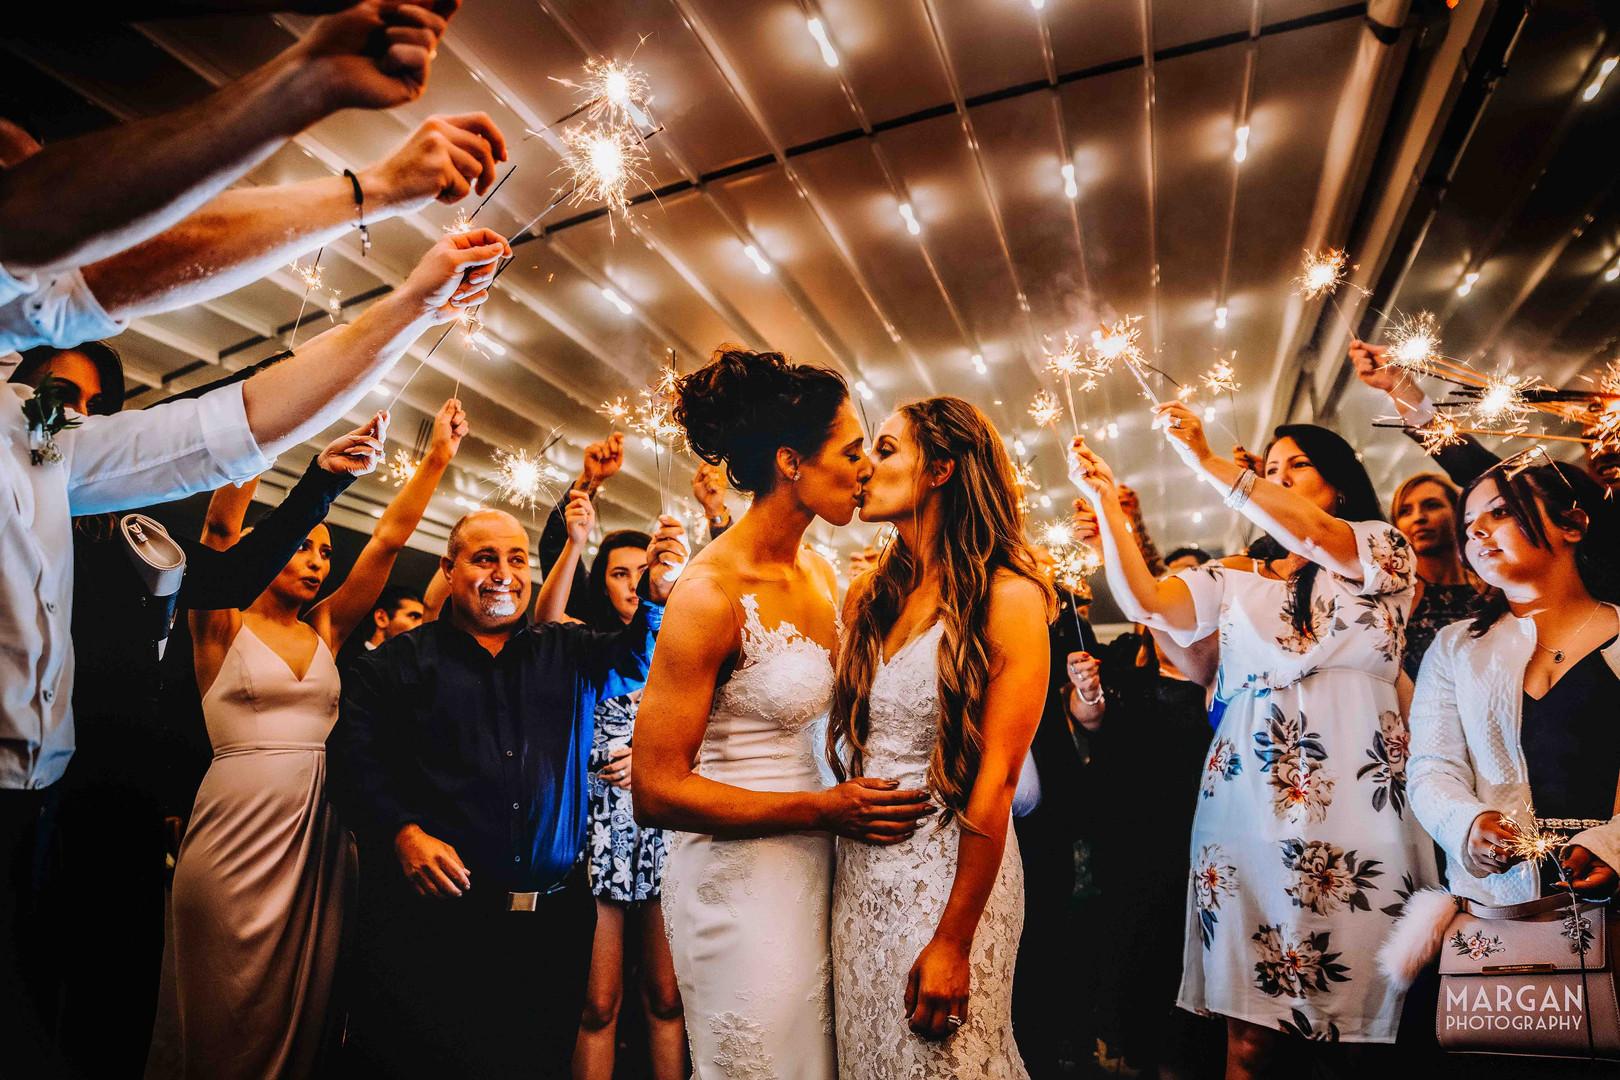 WeddingWebsite_Compressed_A4-2.jpg